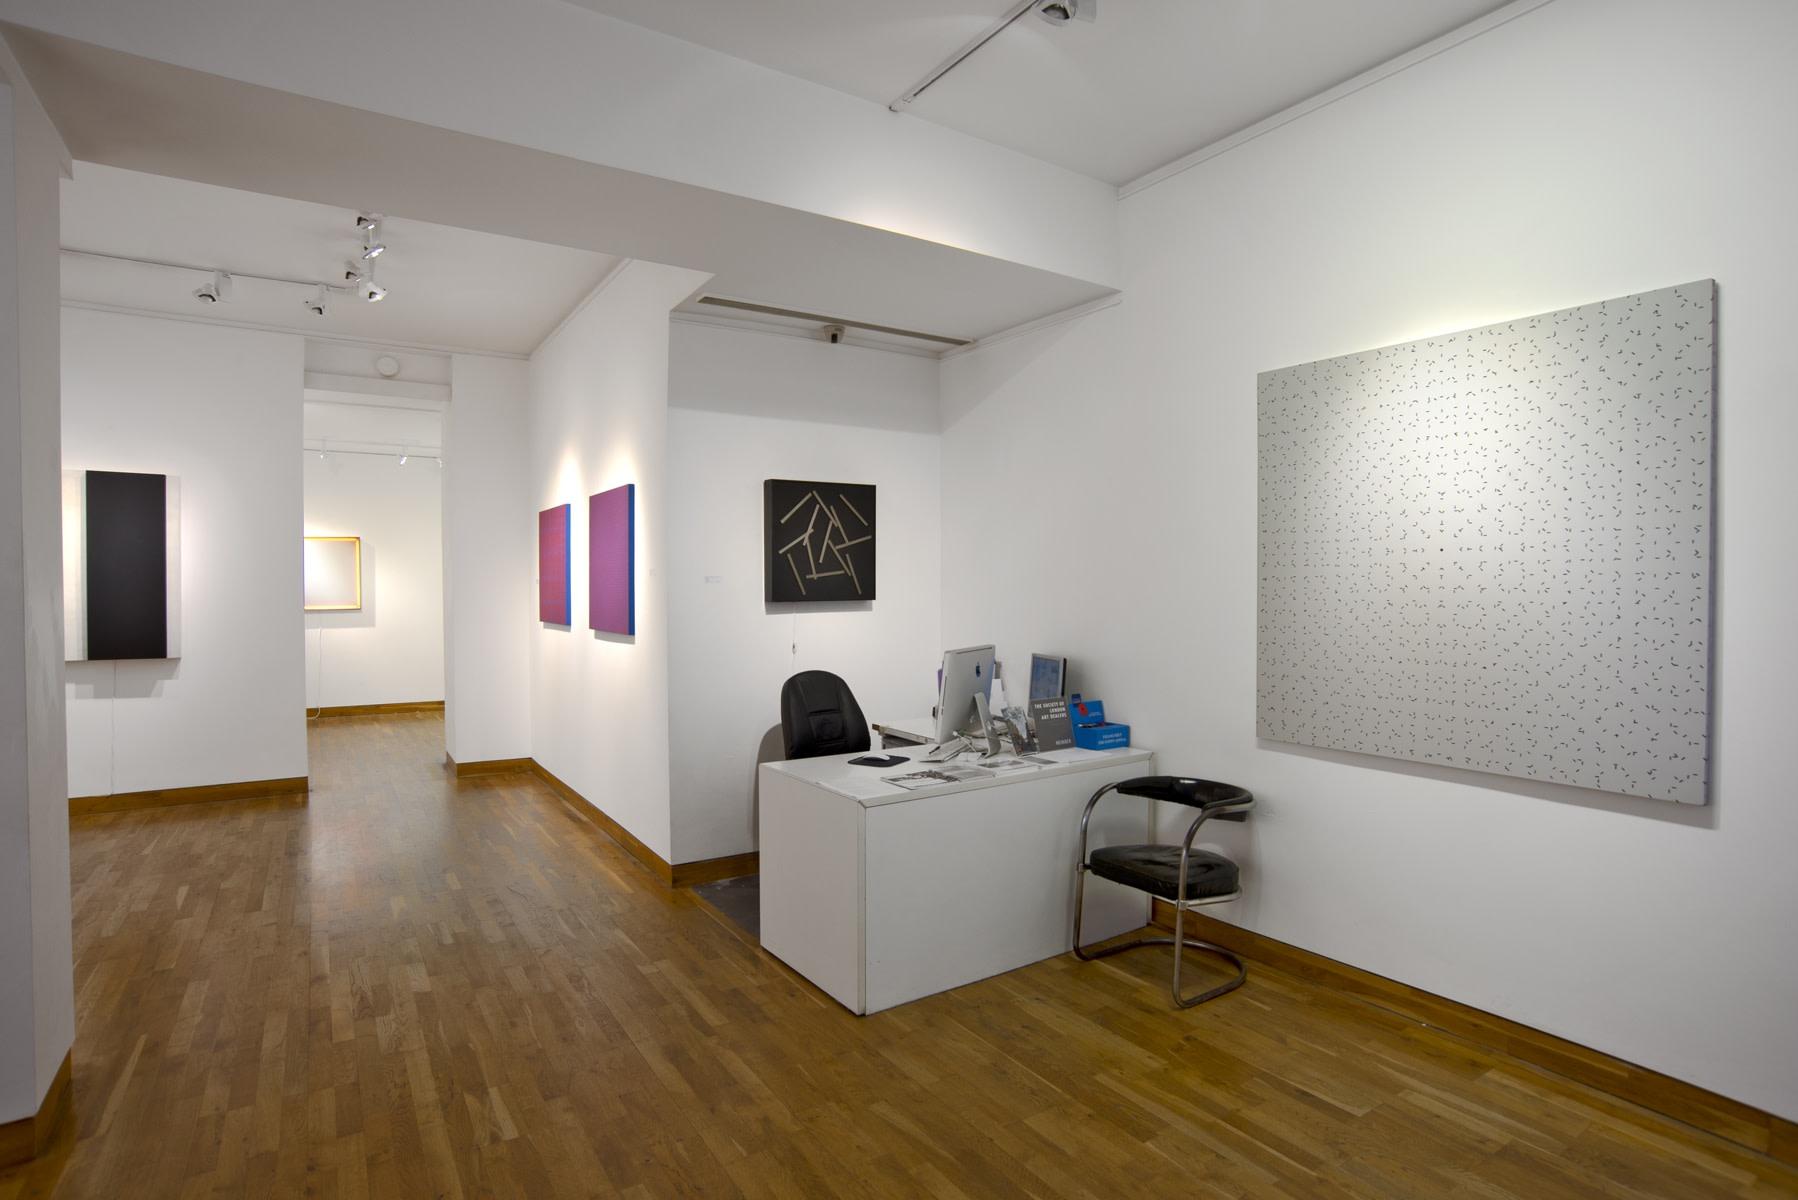 "<span class=""link fancybox-details-link""><a href=""/exhibitions/67/works/image_standalone148/"">View Detail Page</a></span><p>MORELLET & VON GRAVENITZ | MOVING SPIRITS | 1 NOV - 17 DEC 2012 | Installation View</p>"